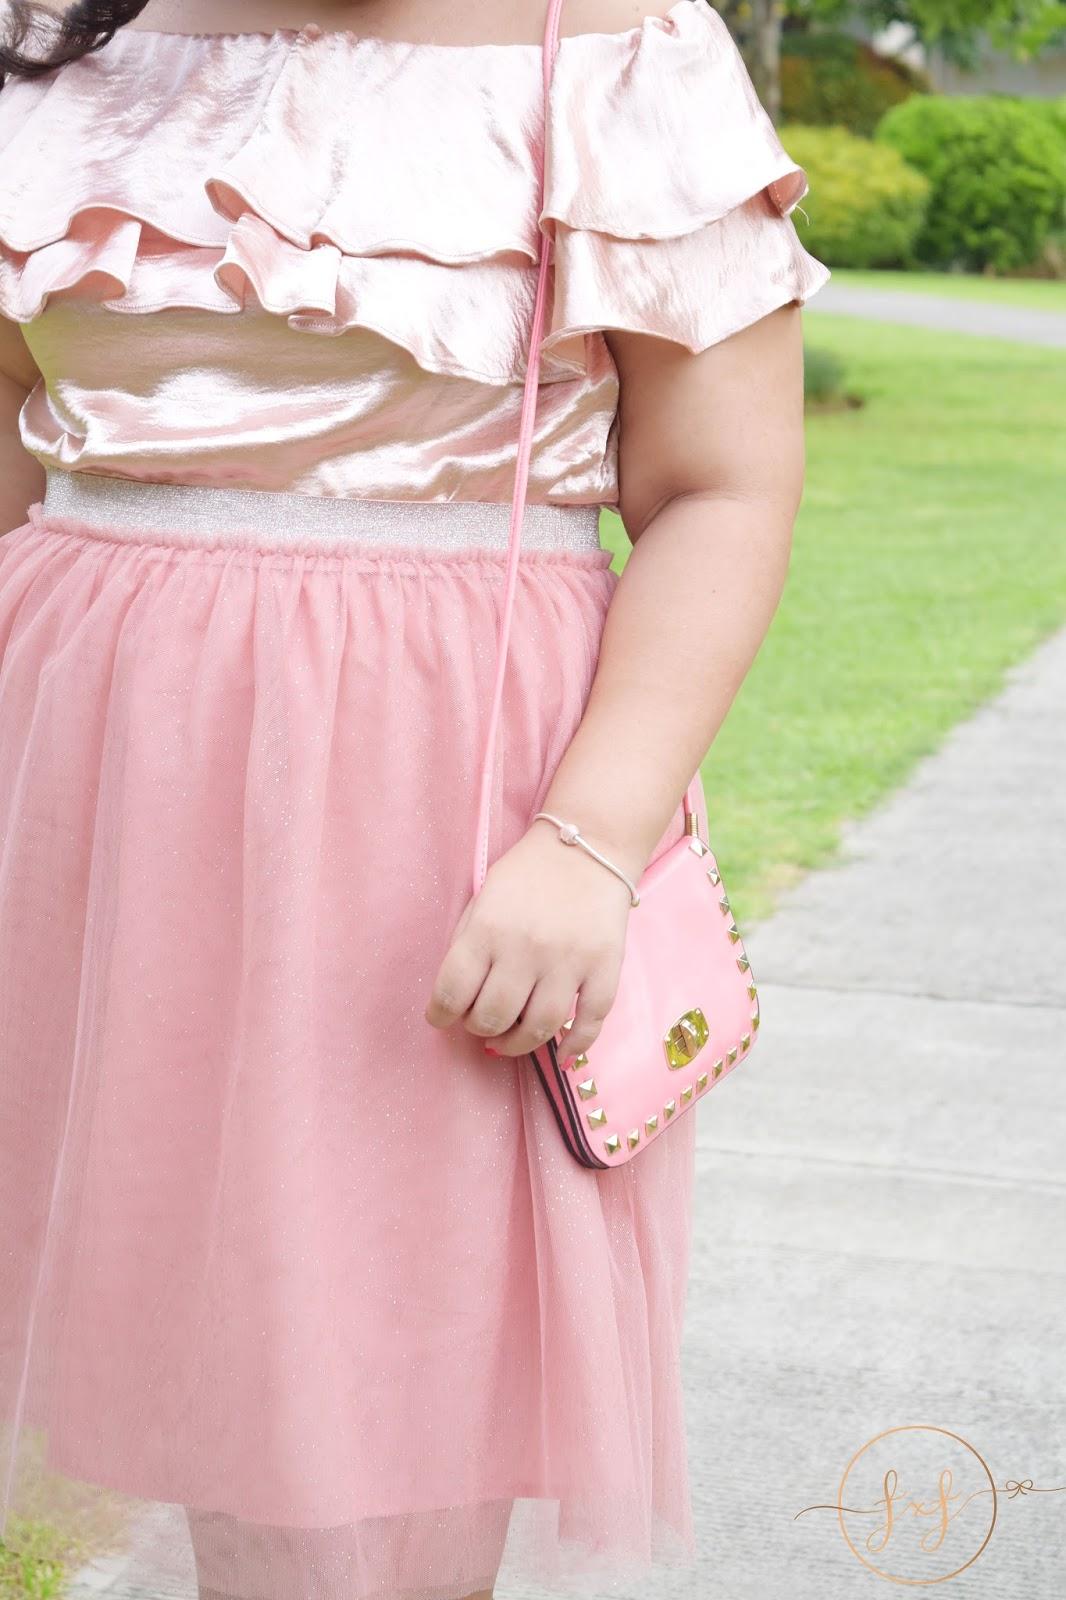 My Pandora Expereience & First Charm Bracelet